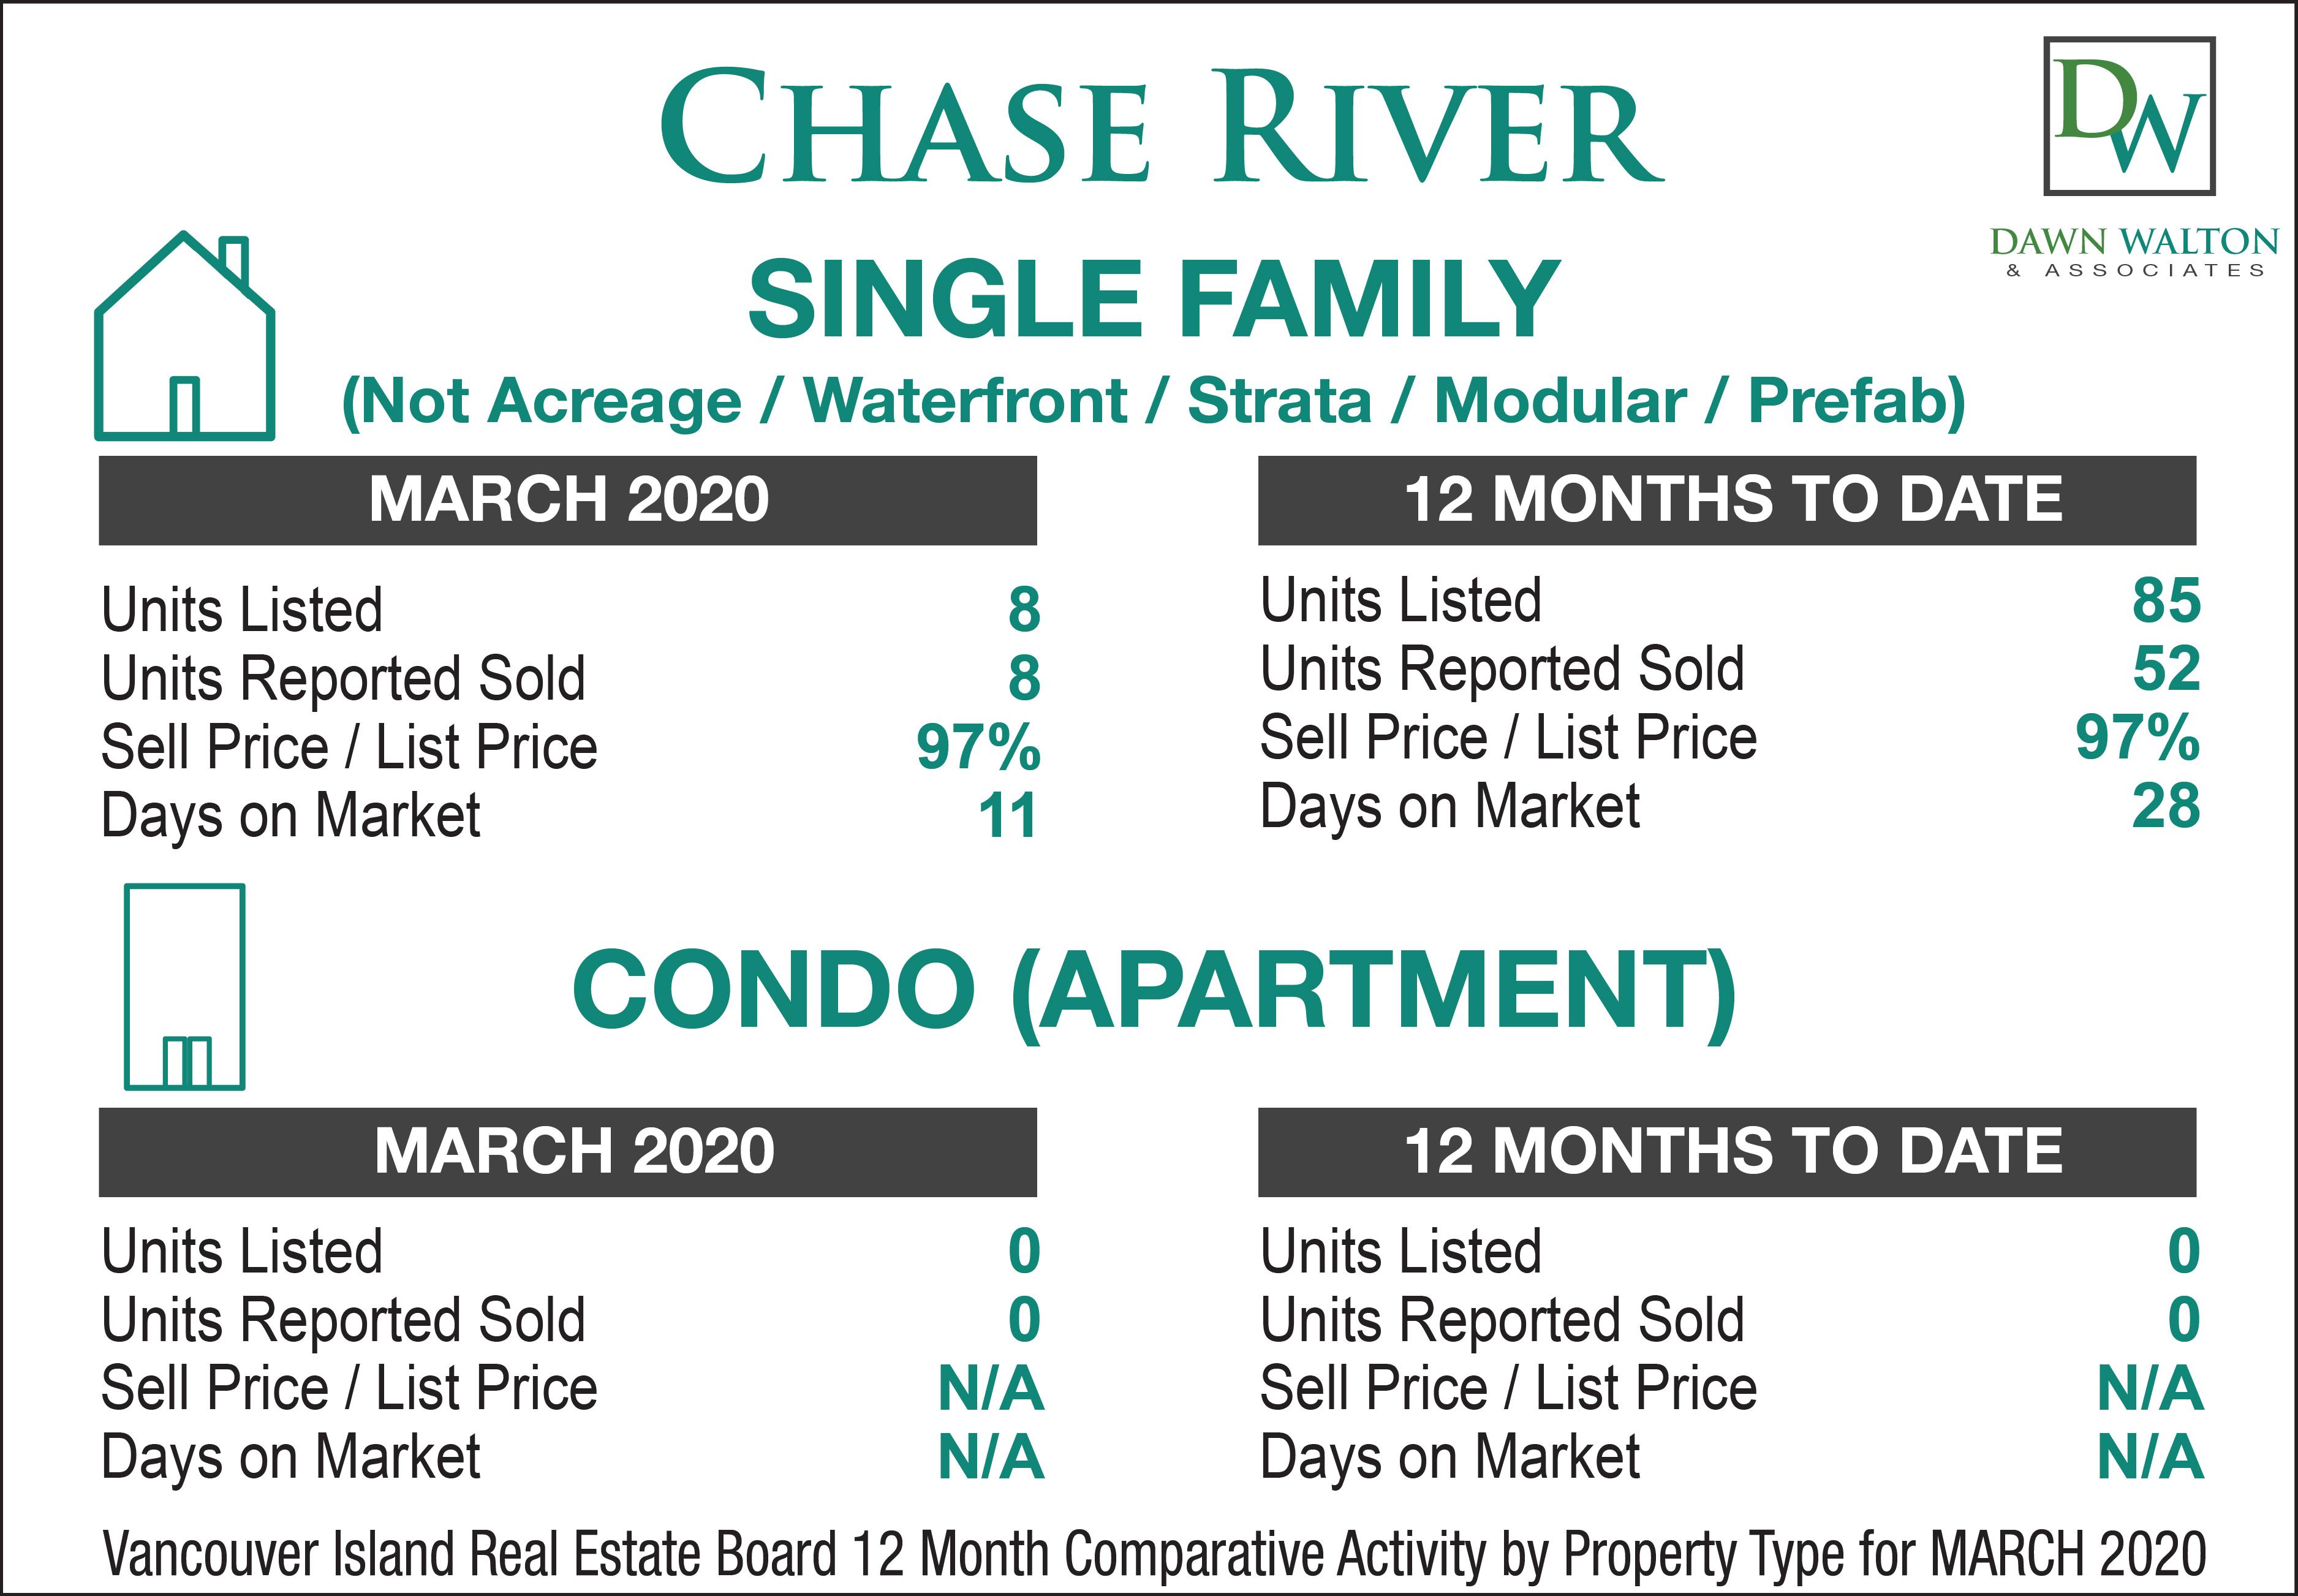 Chase River Real Estate Market Stats March 2020 - Nanaimo Realtor Dawn Walton